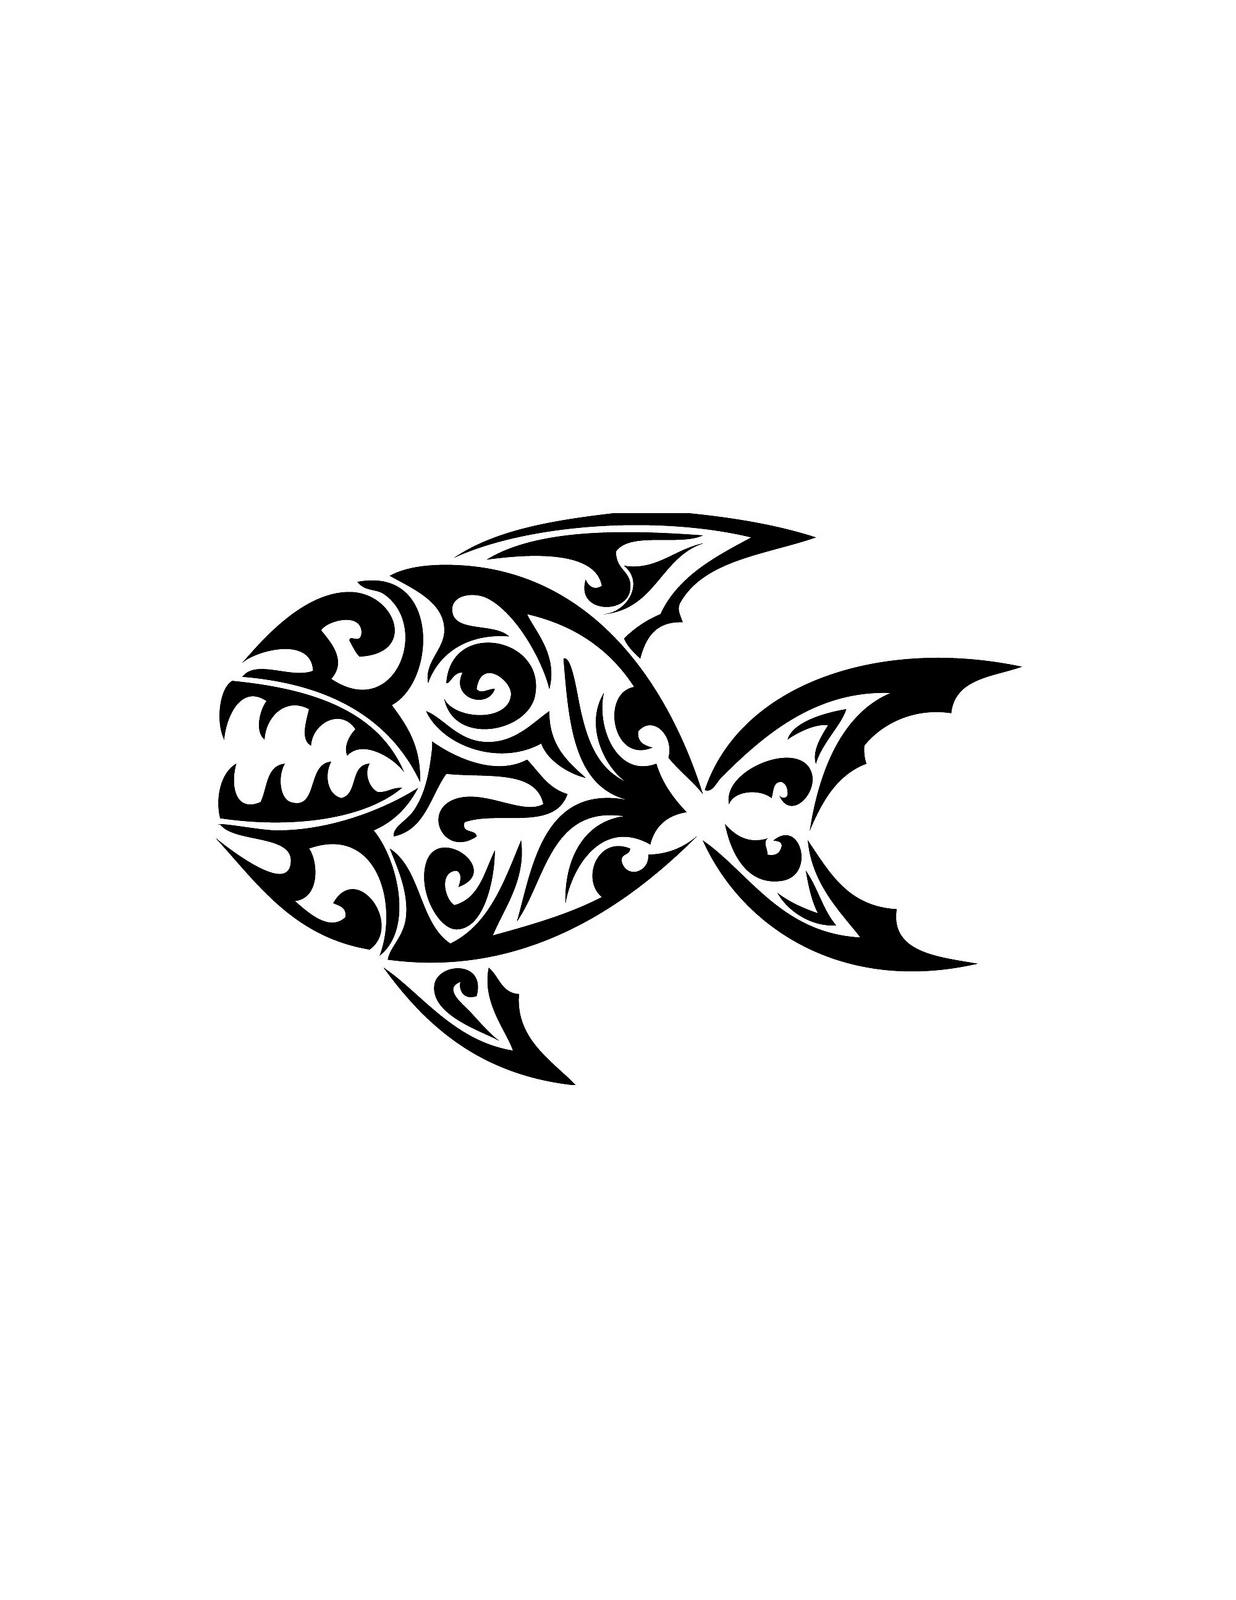 Piranha skeleton tattoo - photo#43